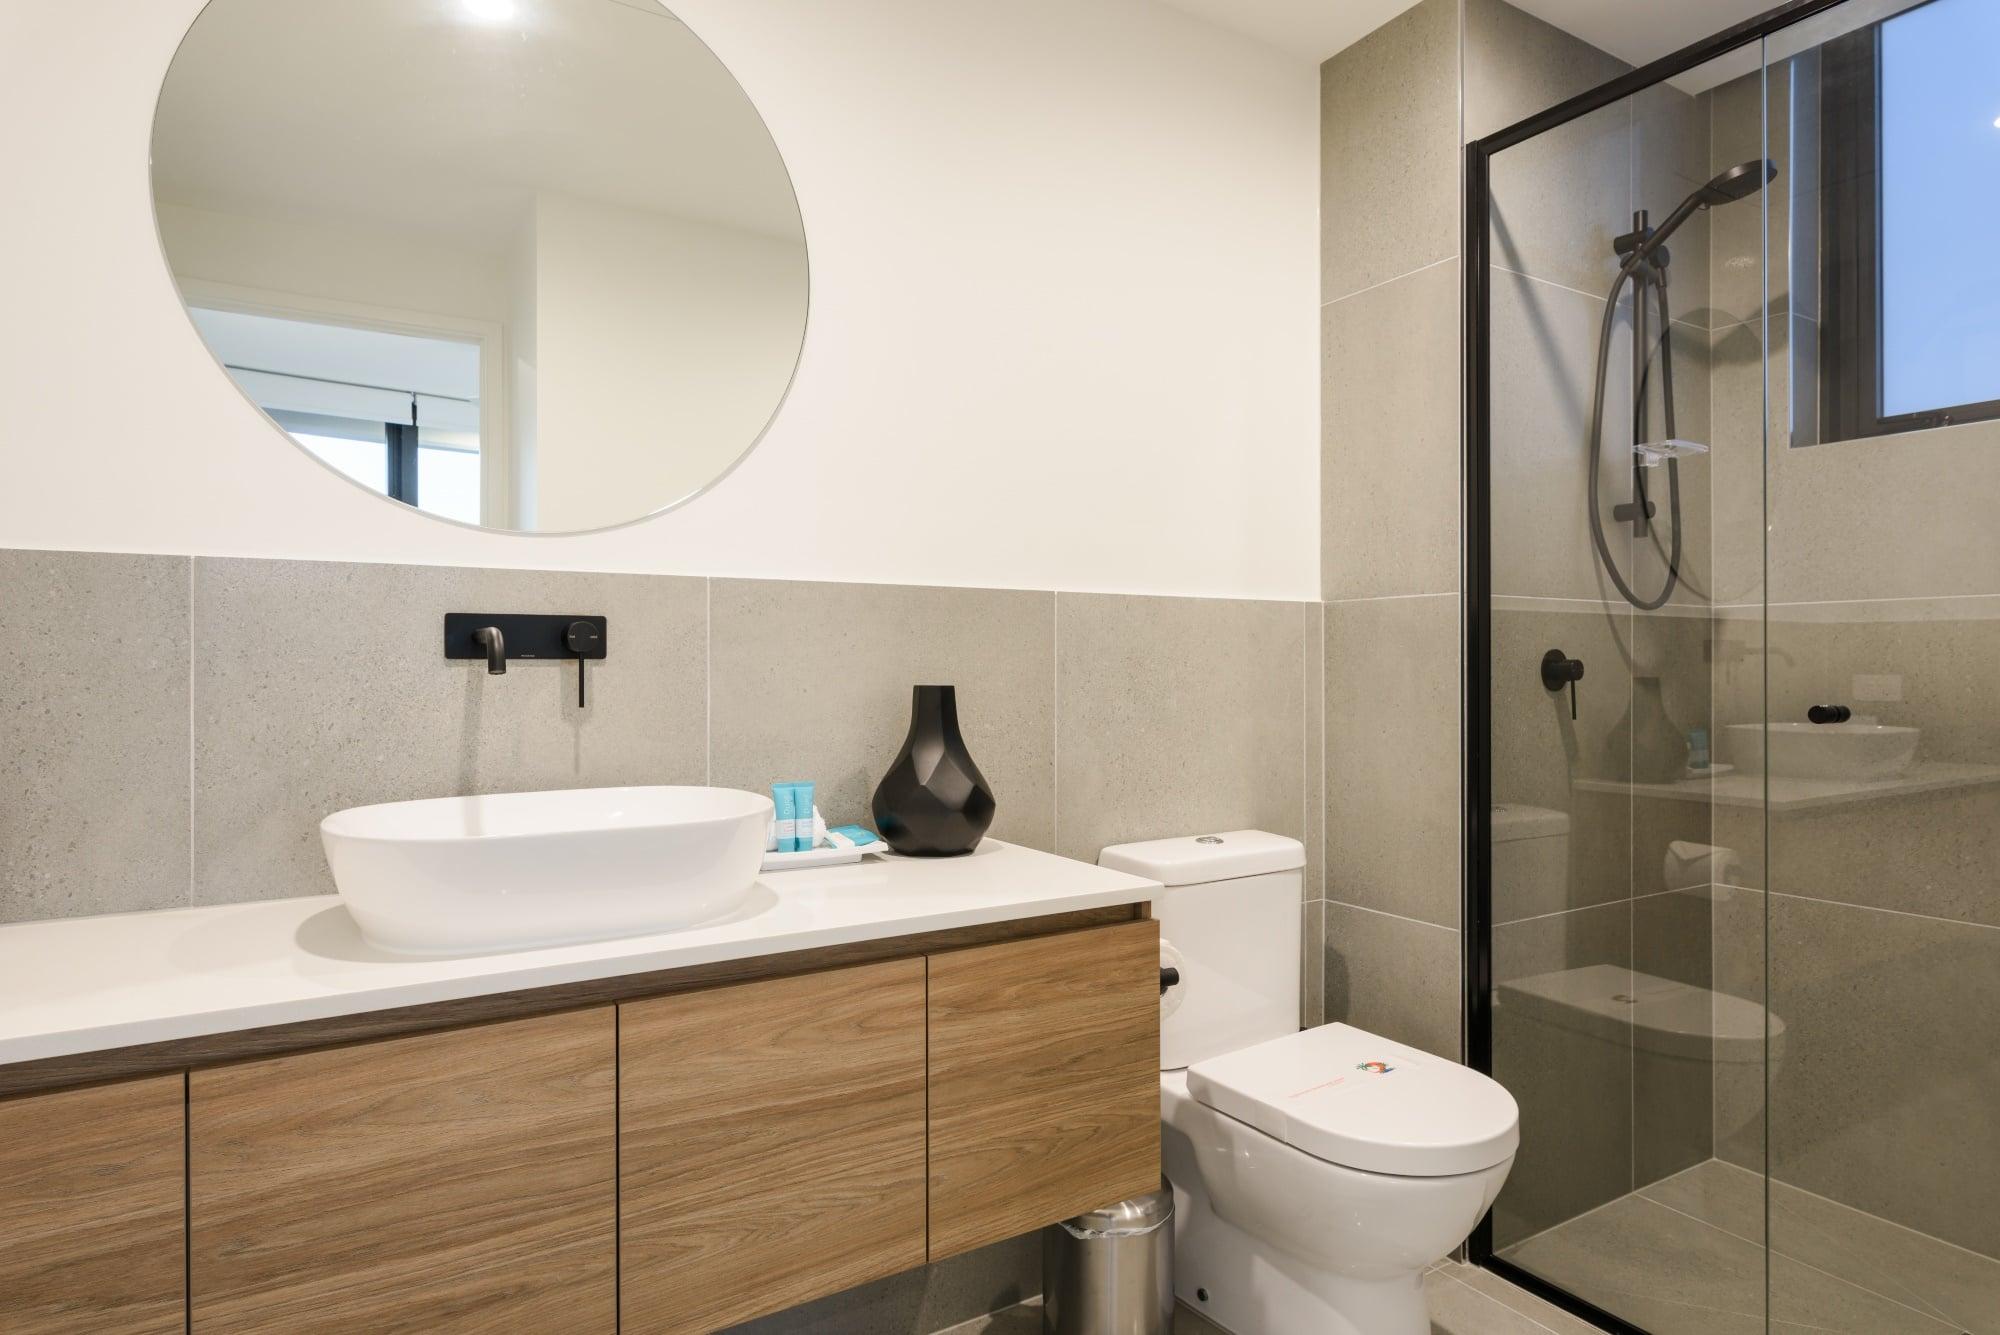 apartment-104-allure-mooloolaba-8